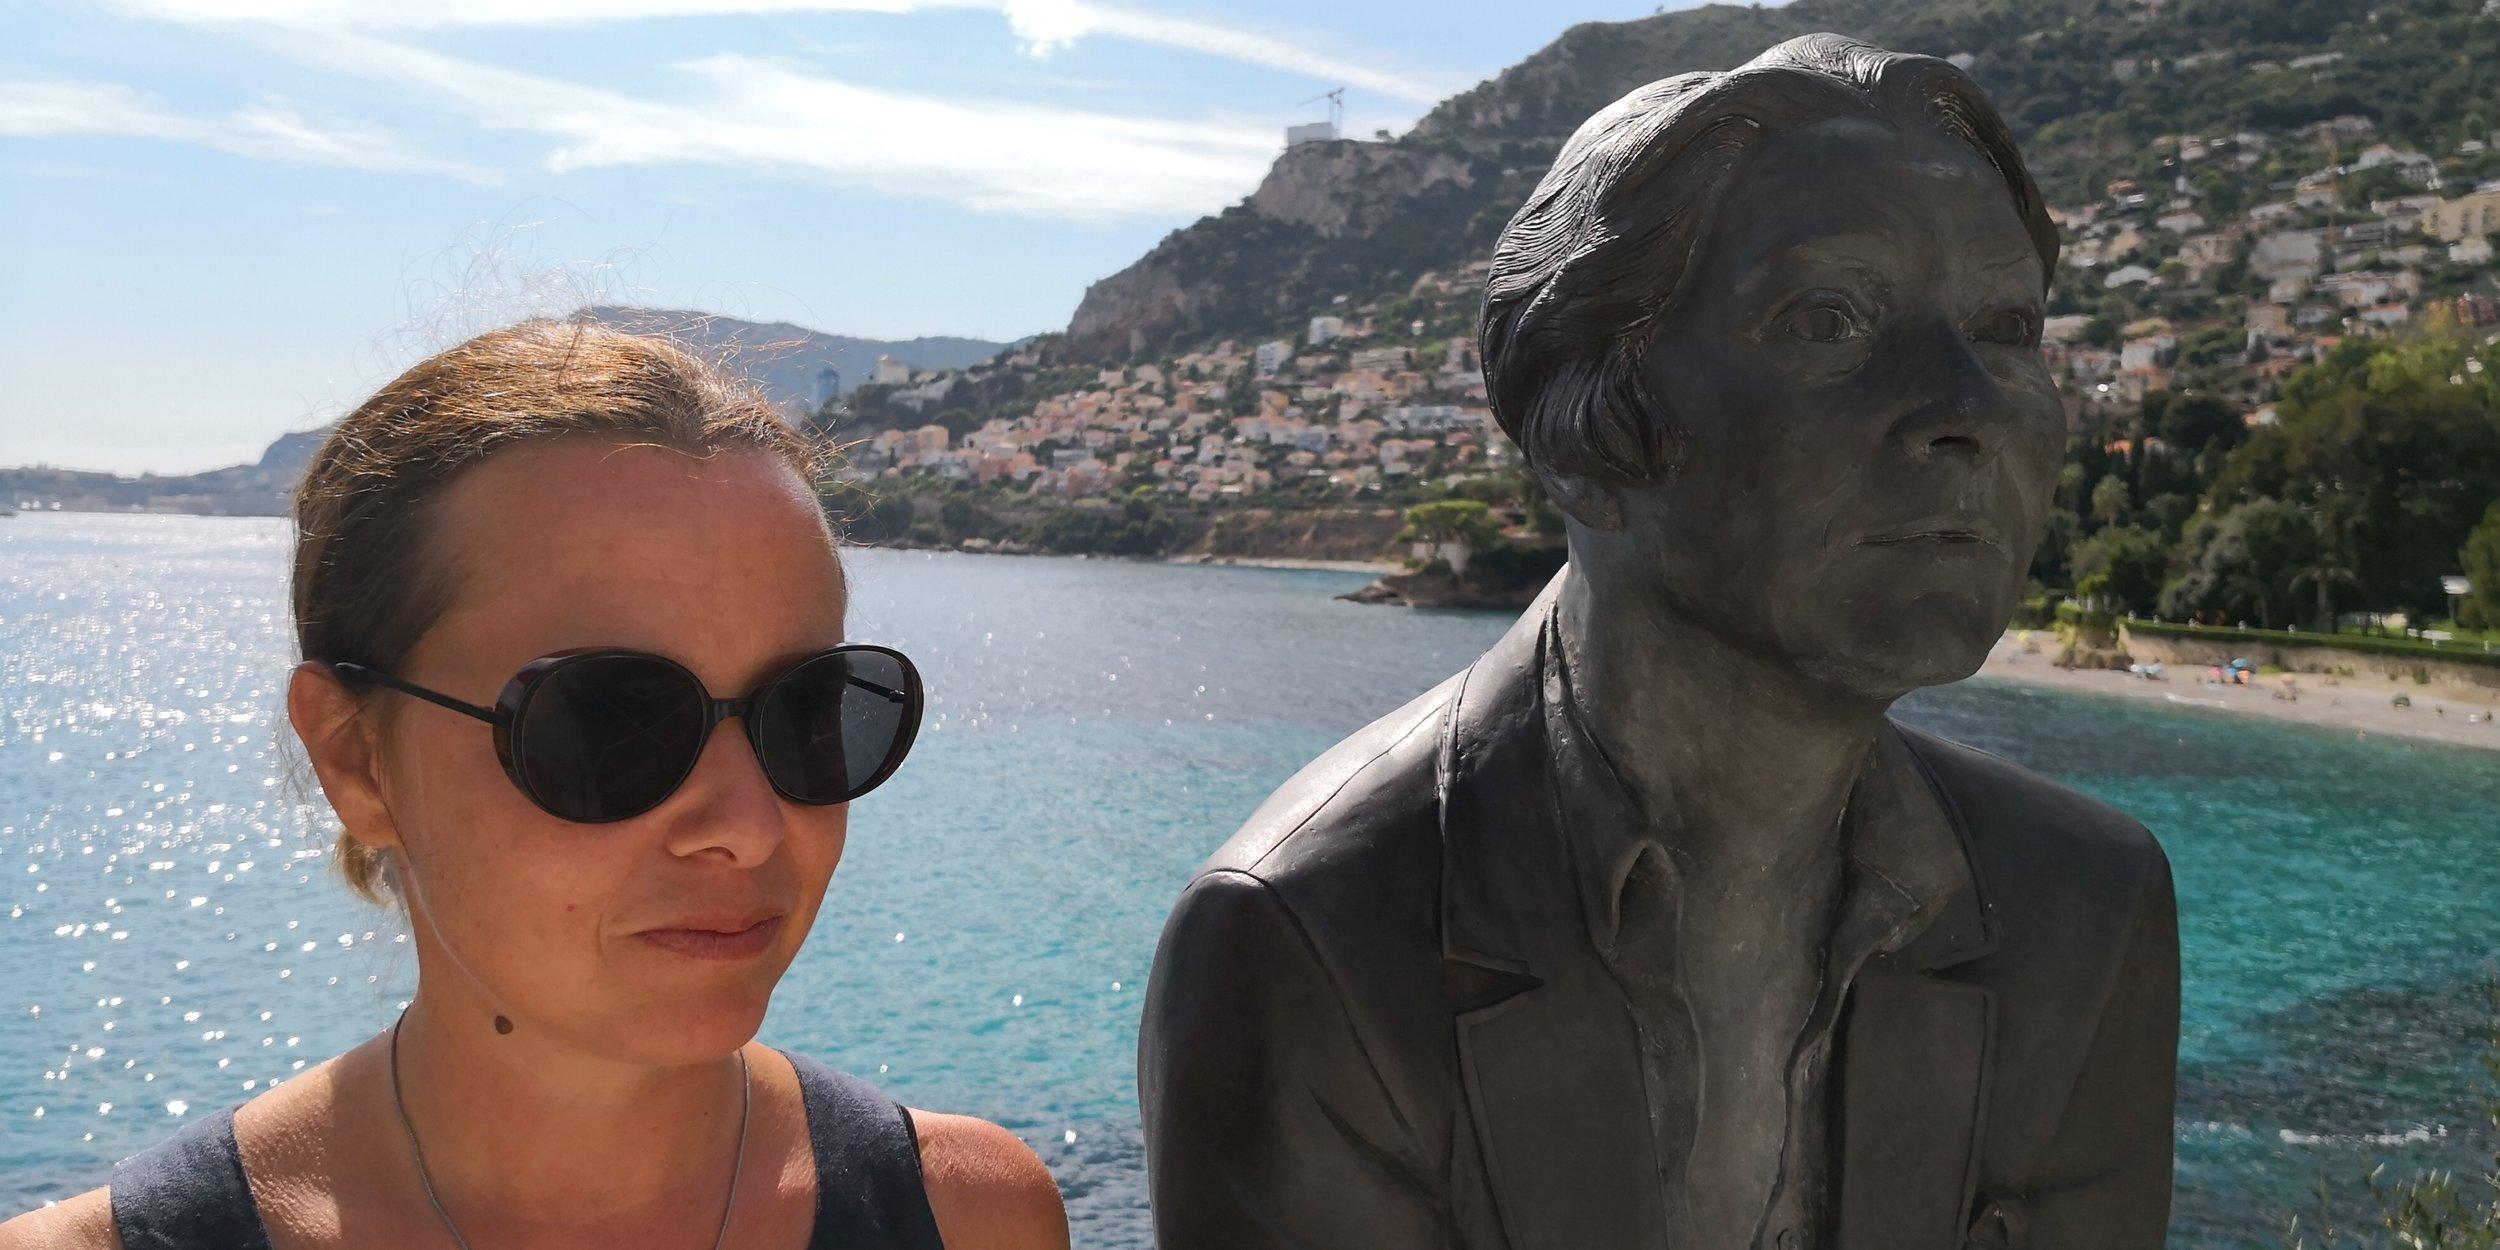 Caterina Franchini, MoMoWo International coordinator, Assistant professor at the Polytechnic of Torino